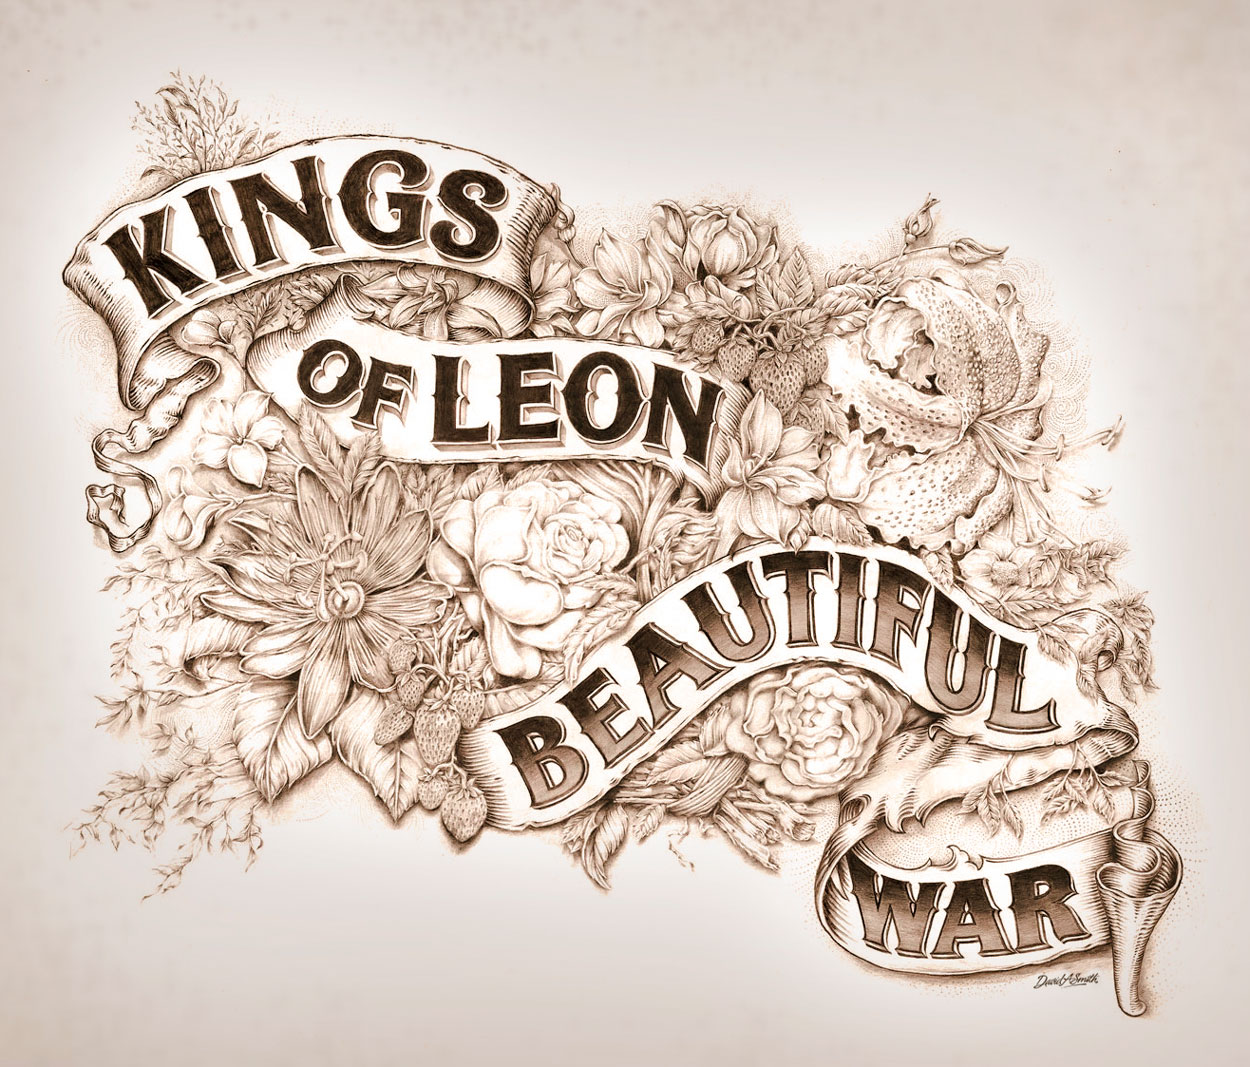 Kings of Leon – Beautiful War Cover Art « David Smith